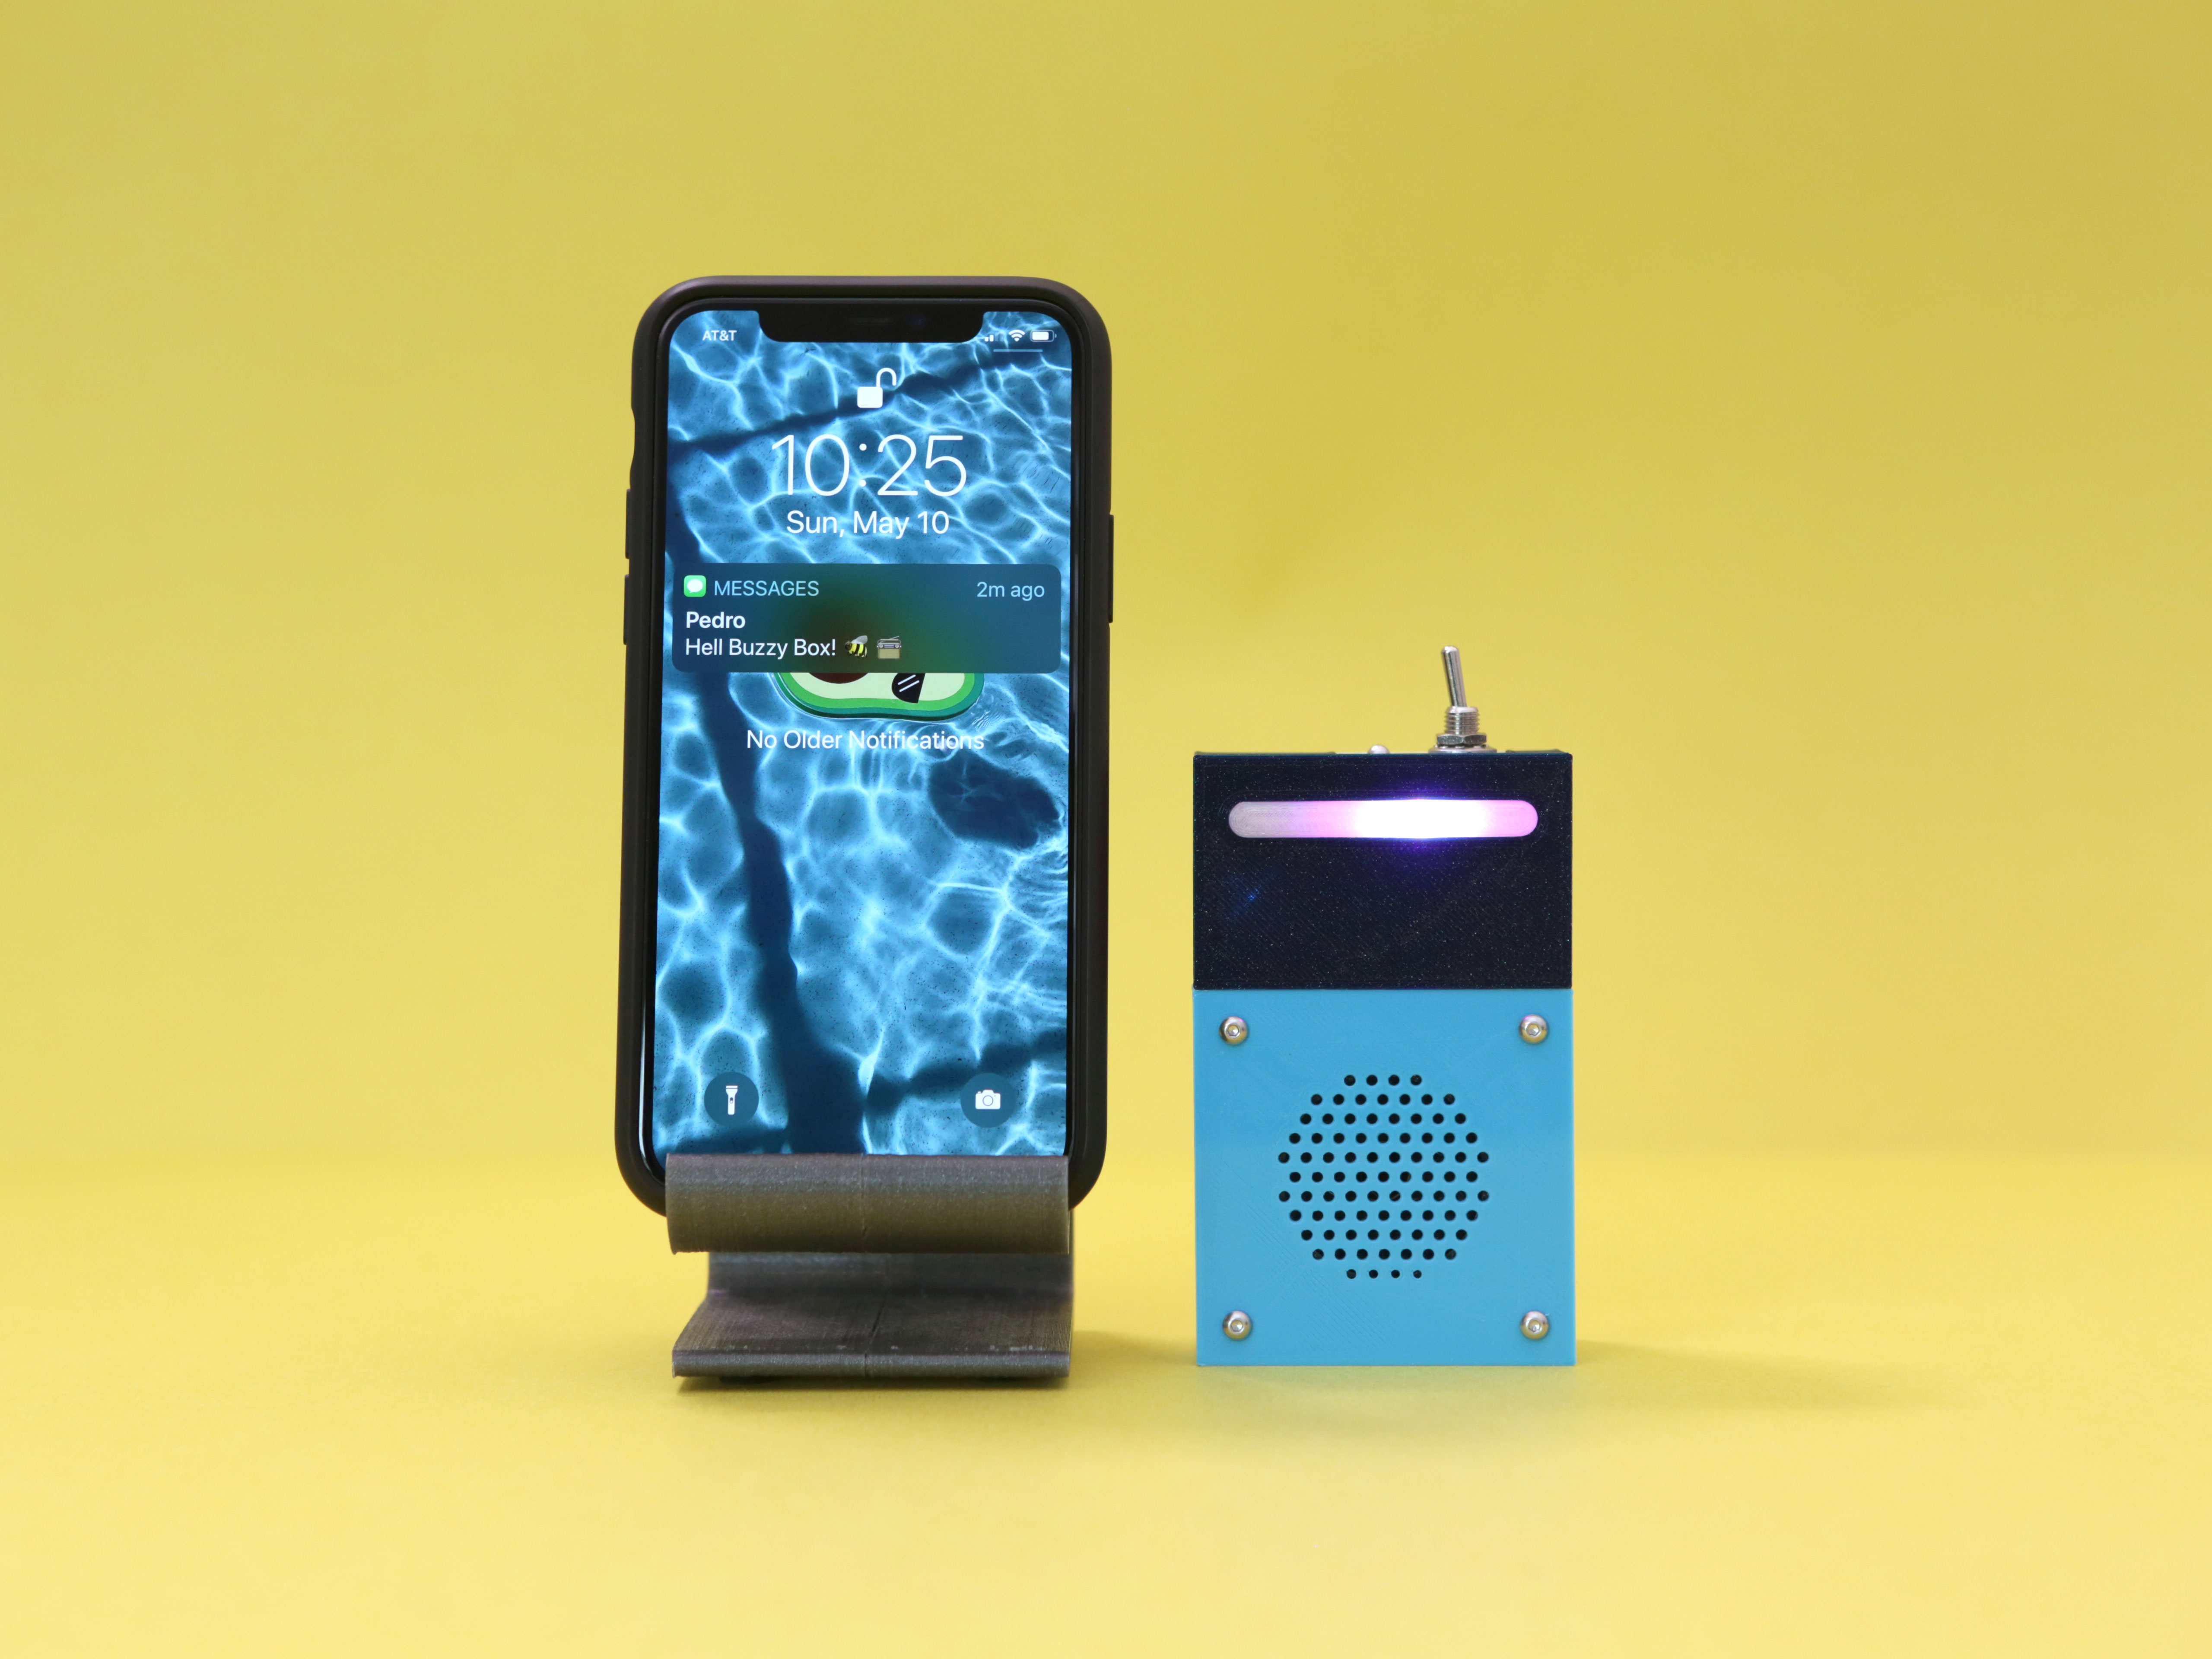 3d_printing_hero-box-phone.jpg